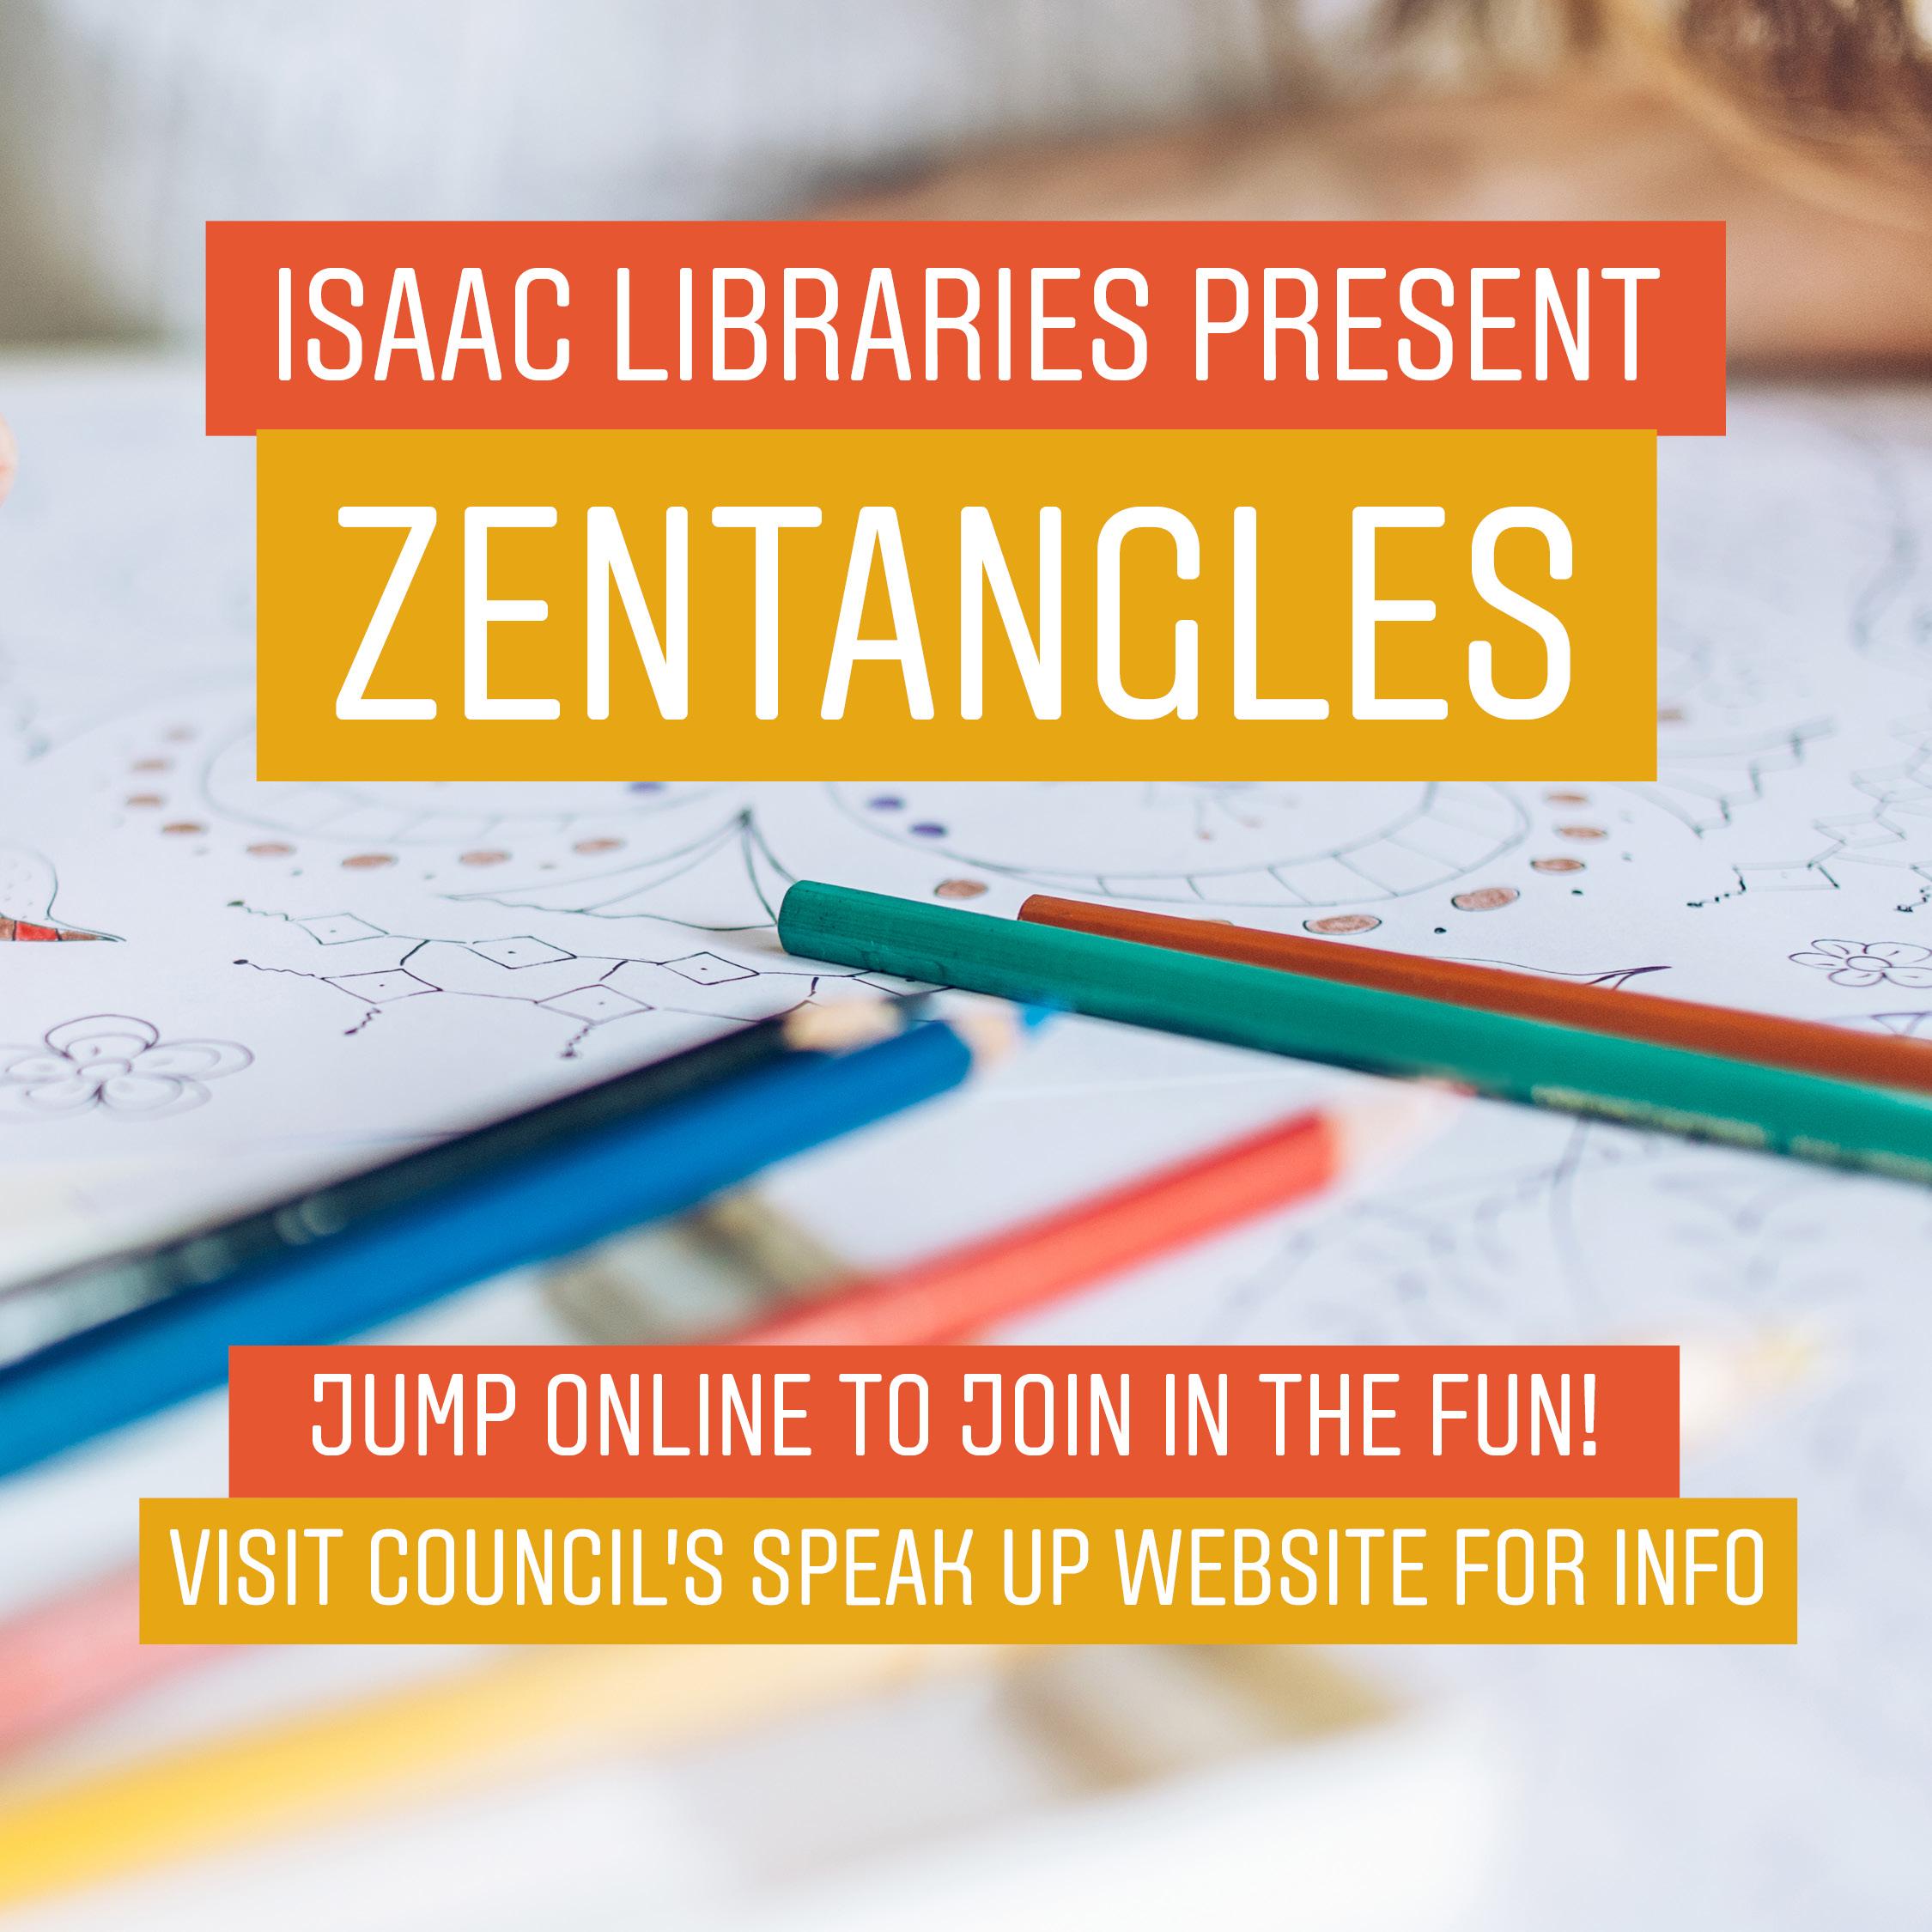 Unwind creativity with Isaac Libraries' online art program